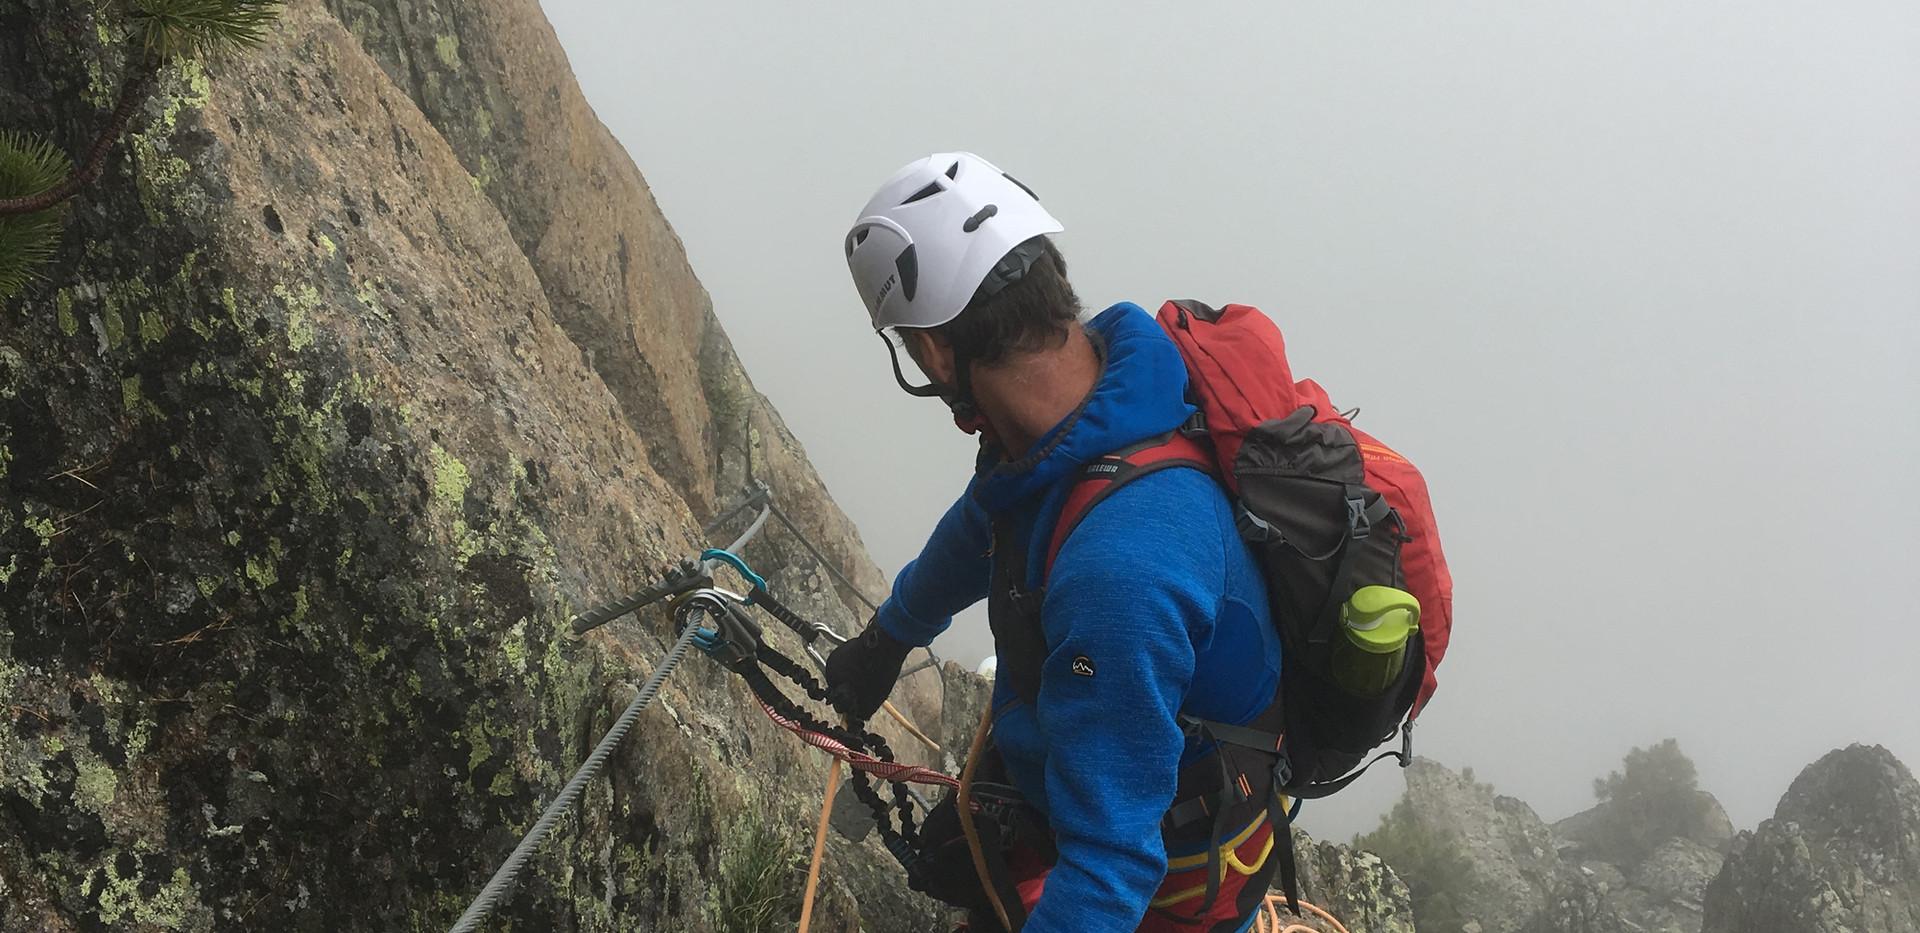 Fernau Klettersteig im Nebel.JPG